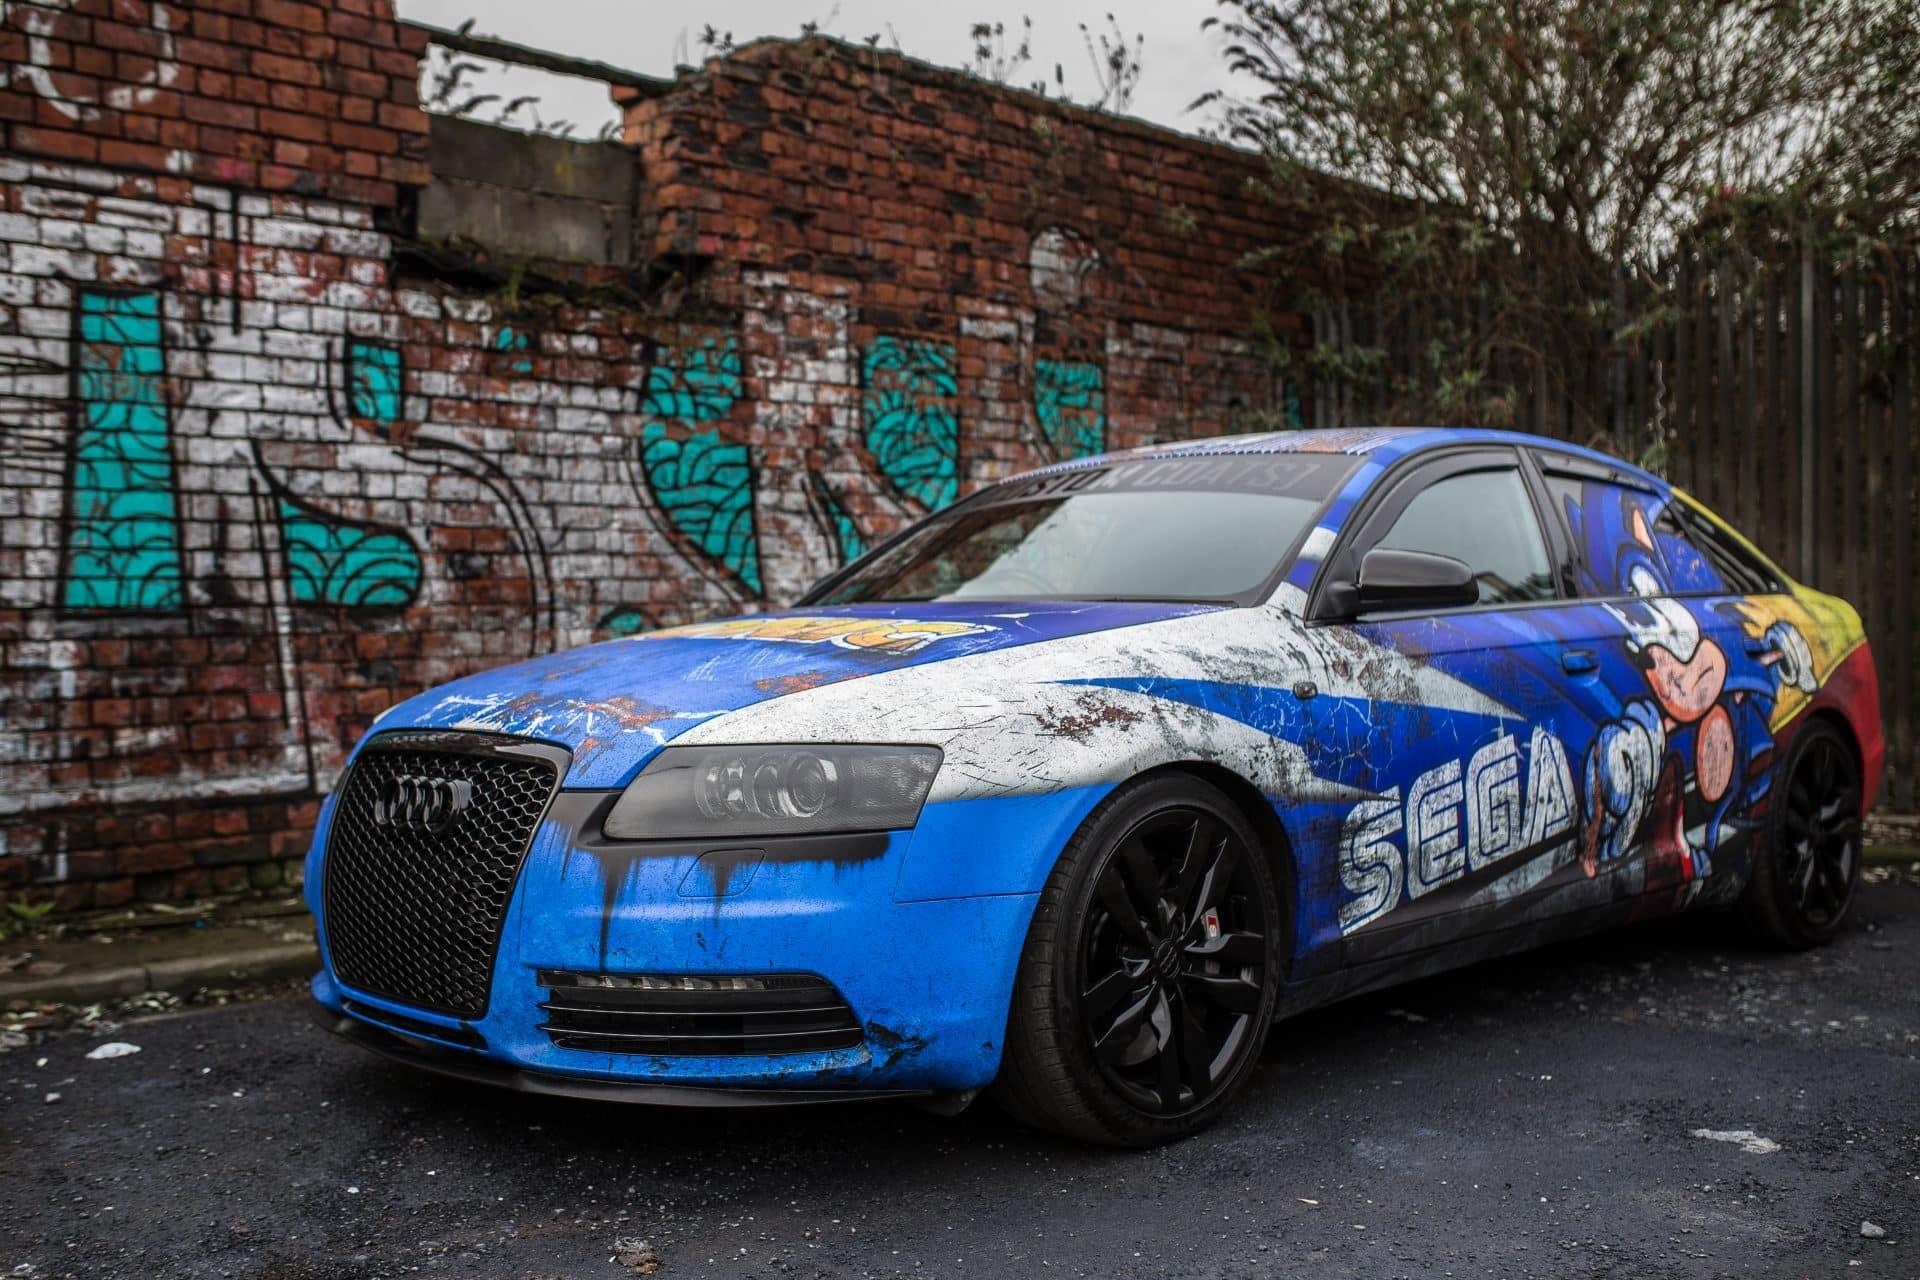 SEGA Rust Wrap Audi S By Skepple Inc And Custom Coats Skepple Inc - Audi custom